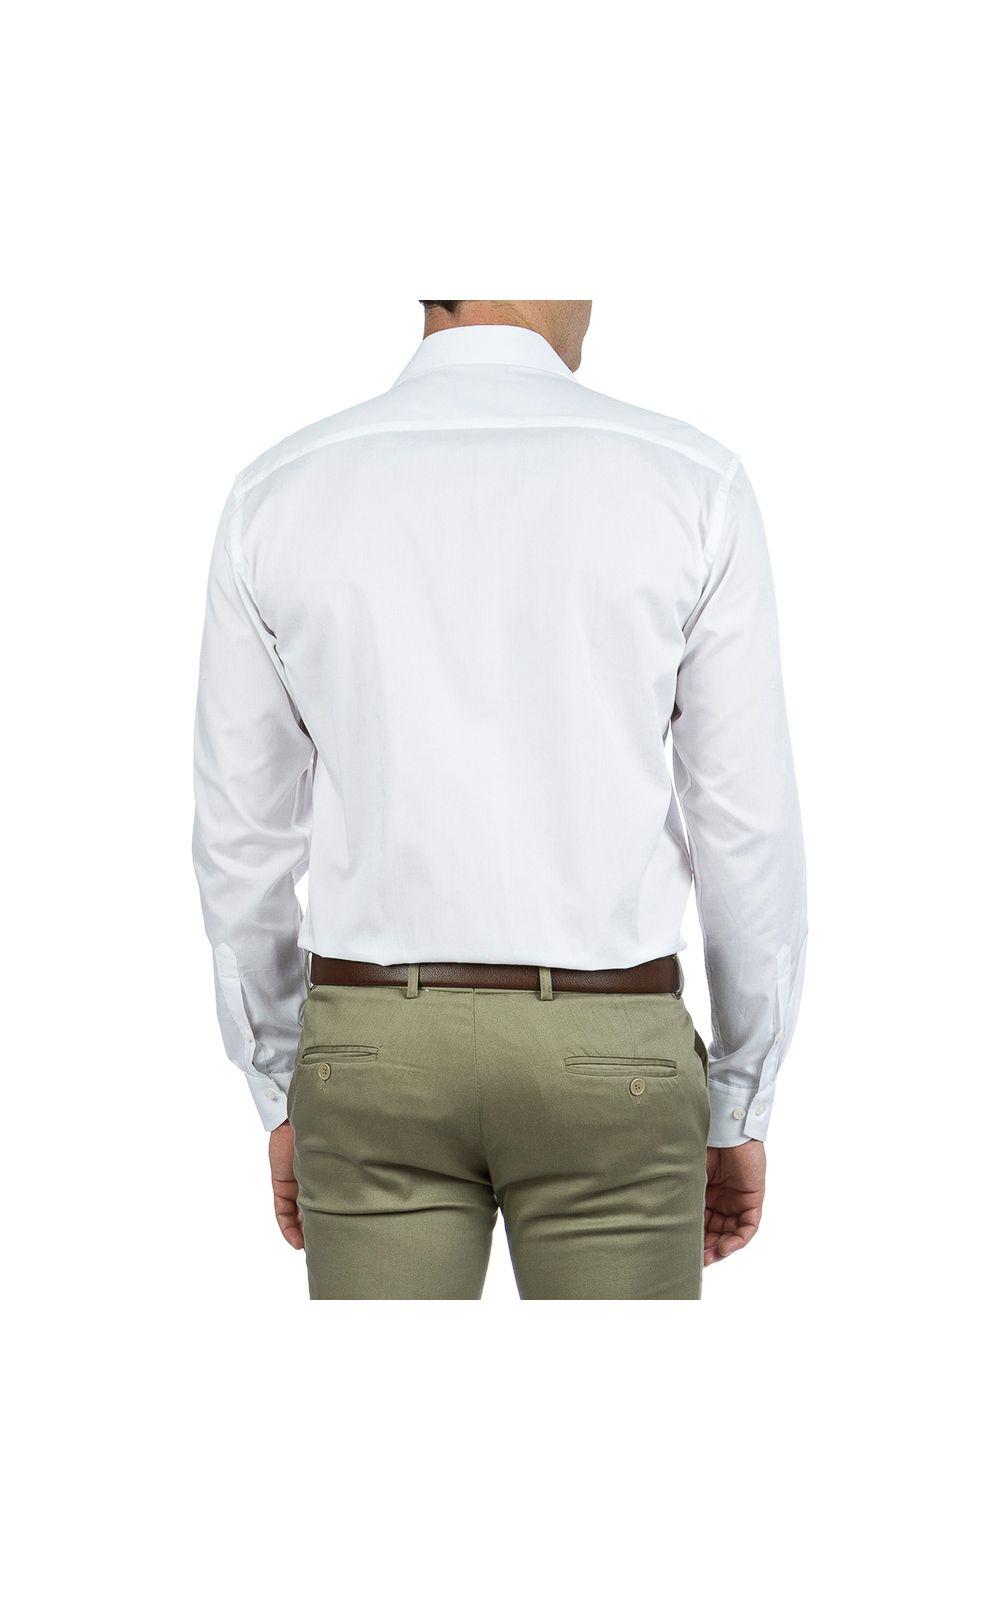 Foto 2 - Camisa Social Masculina Branca Lisa